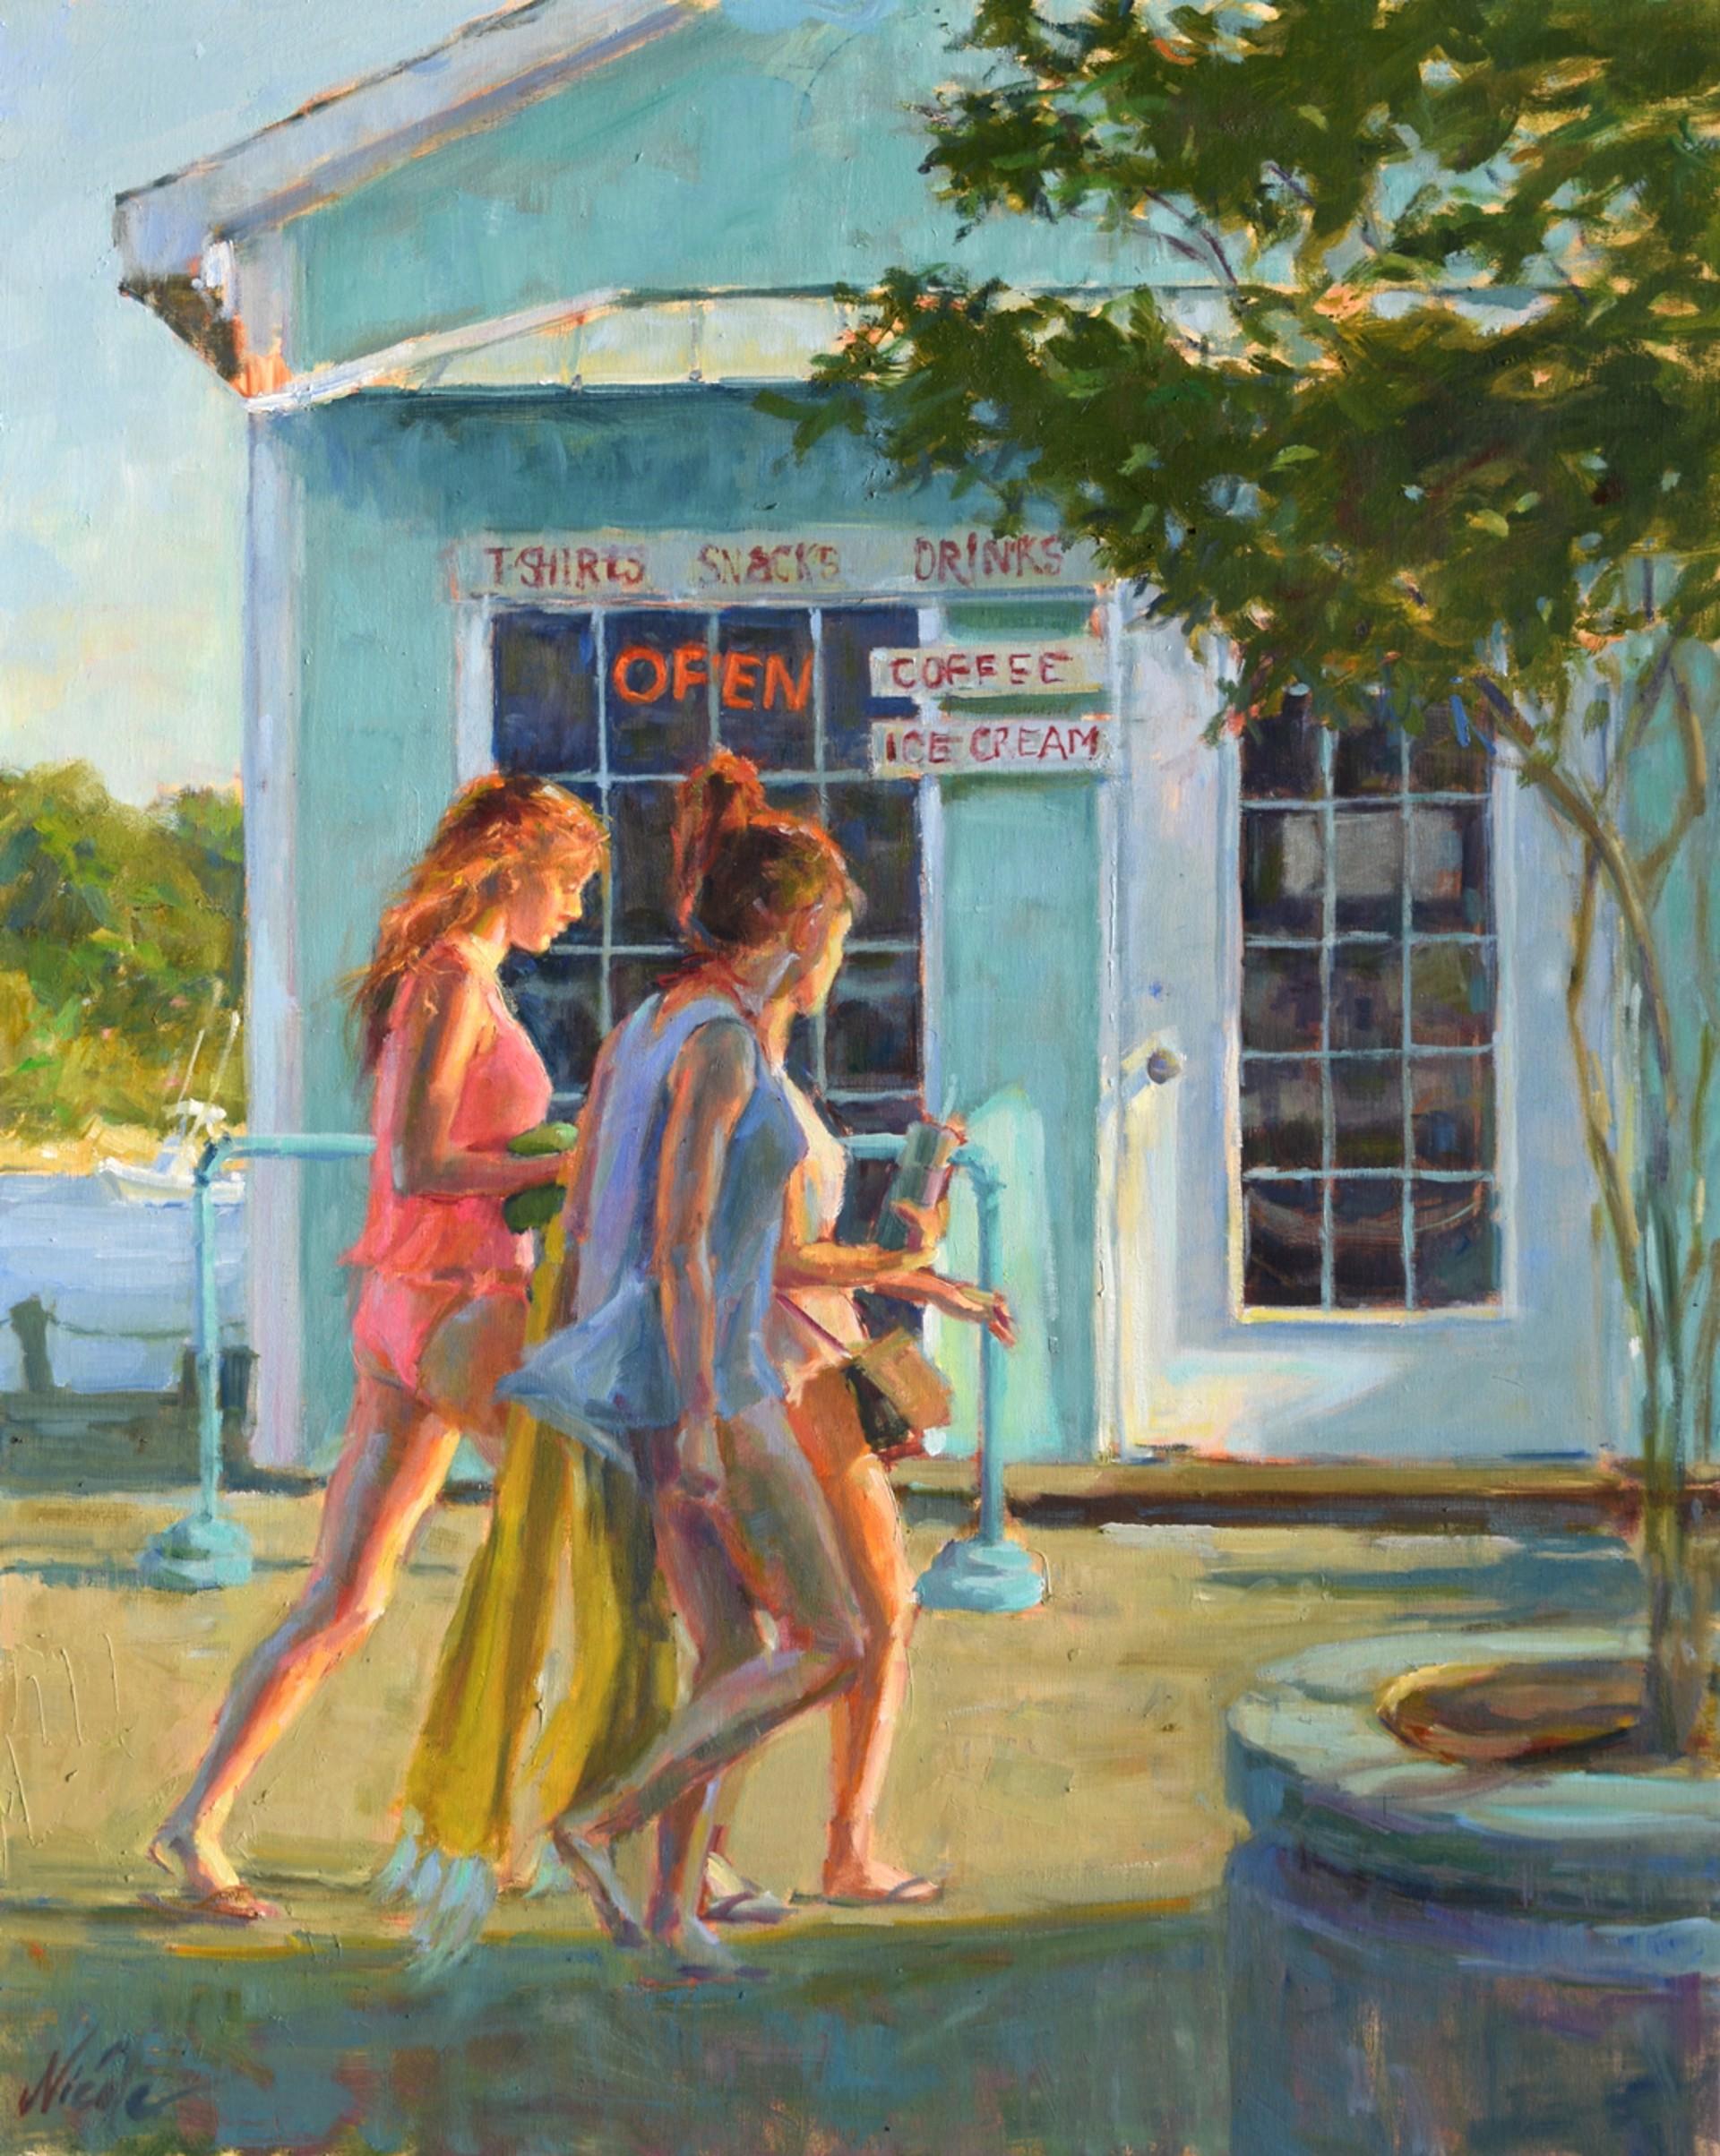 Summer in Full Swing by Nicole White Kennedy